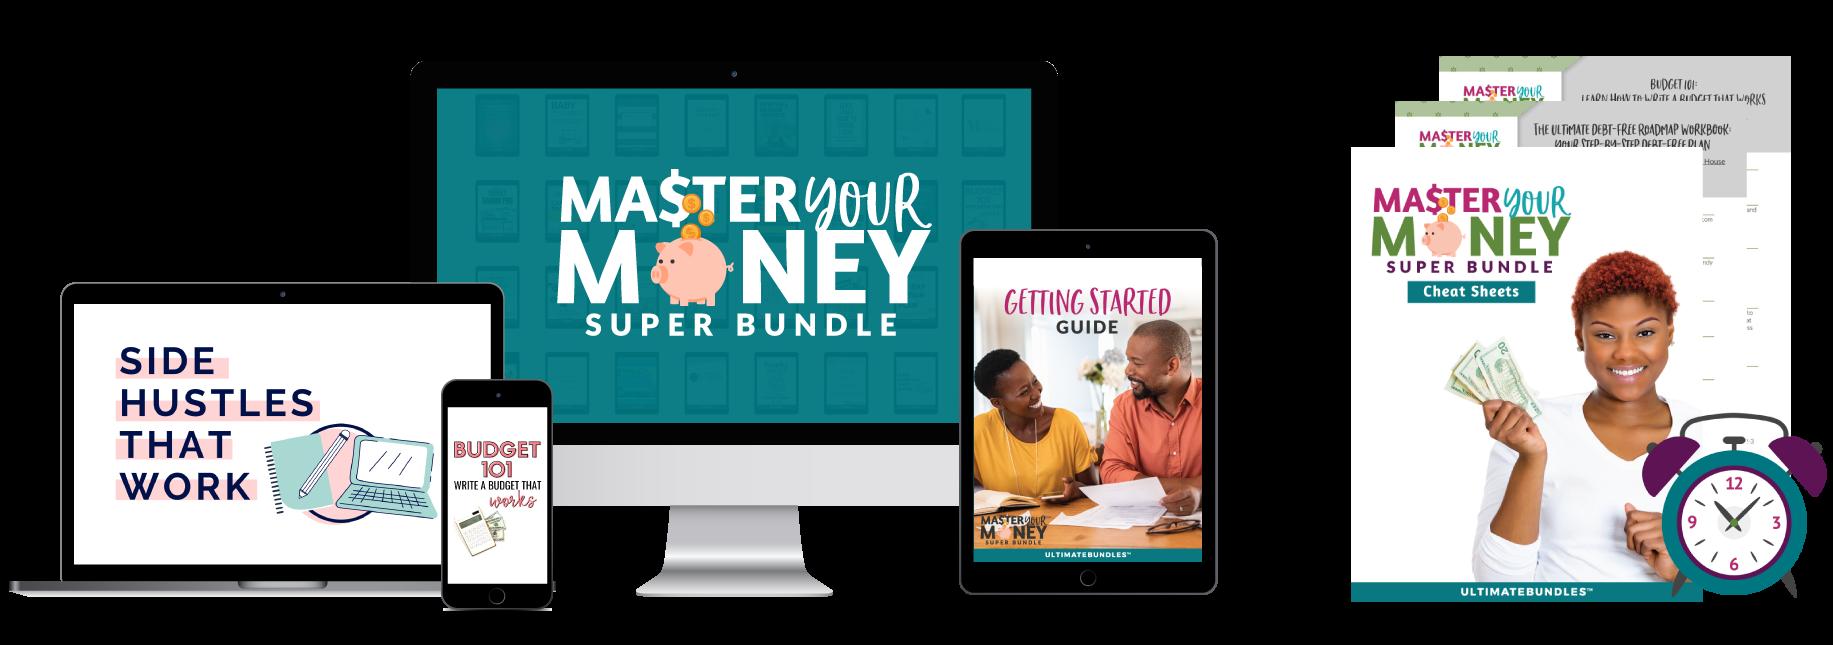 Master Your Money Super Bundle 2020